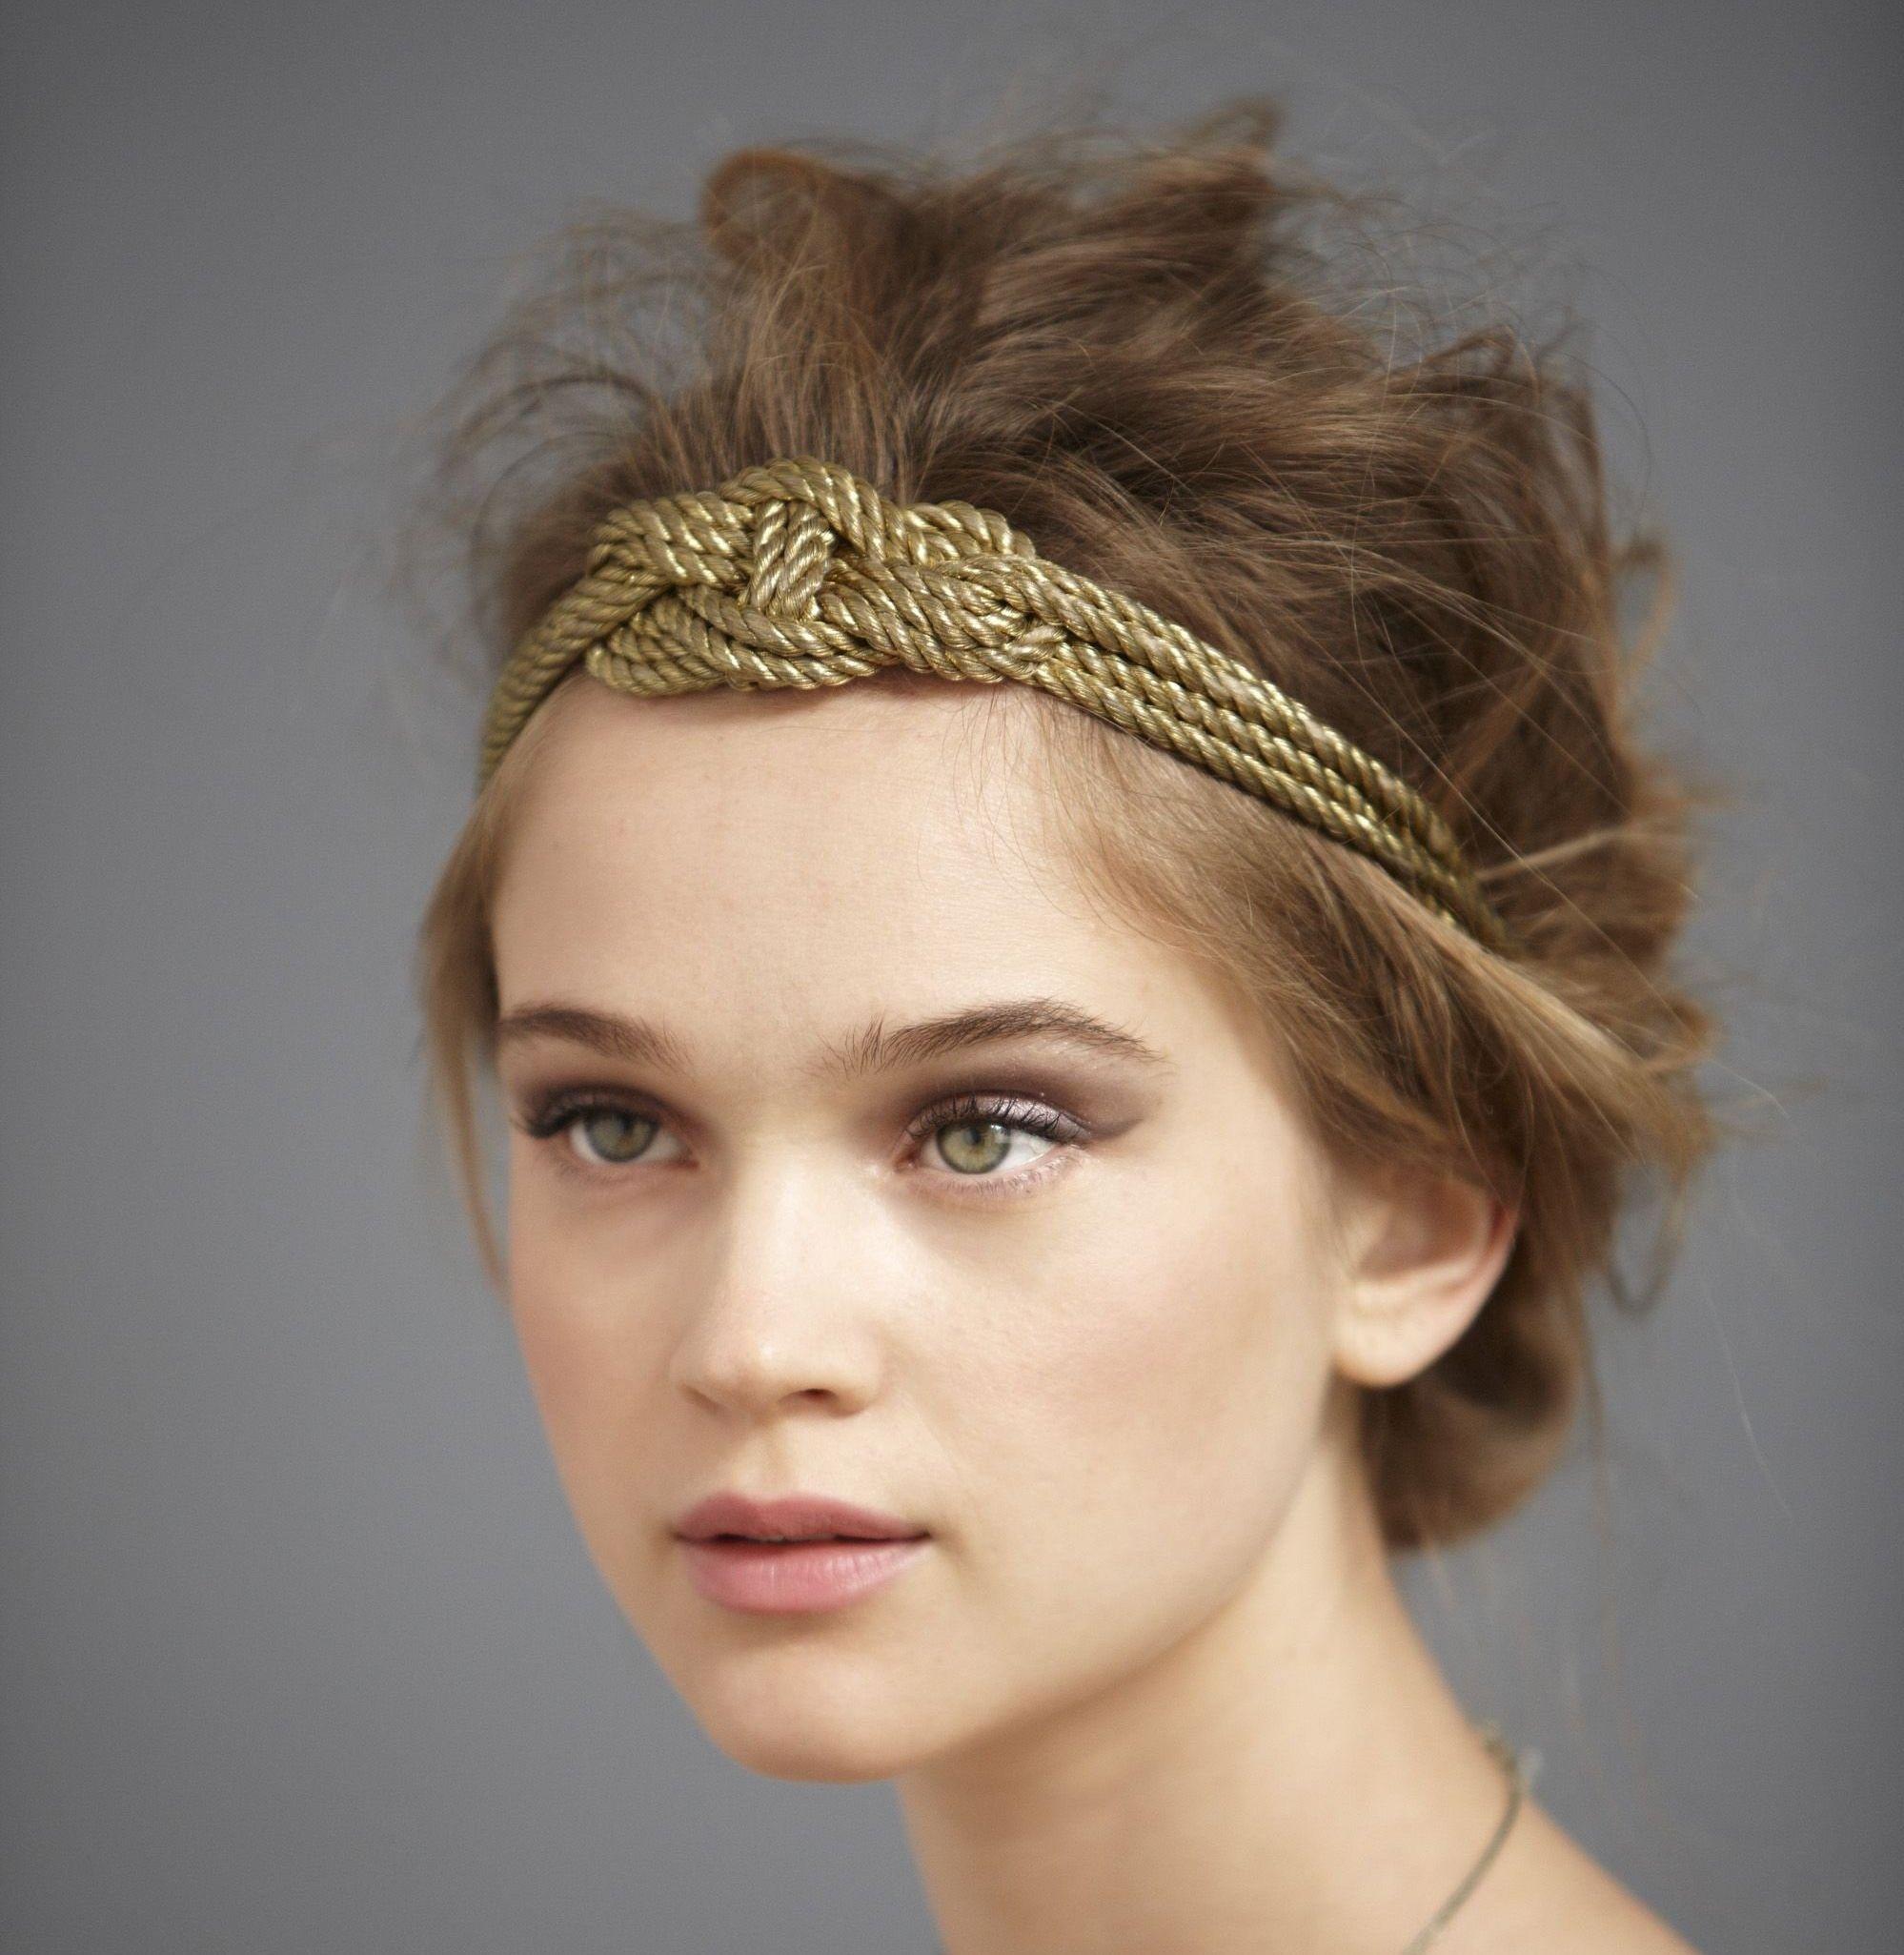 Ancient Greek Hairstyles For Women 16 JPEG Grafik 1998 — 2051